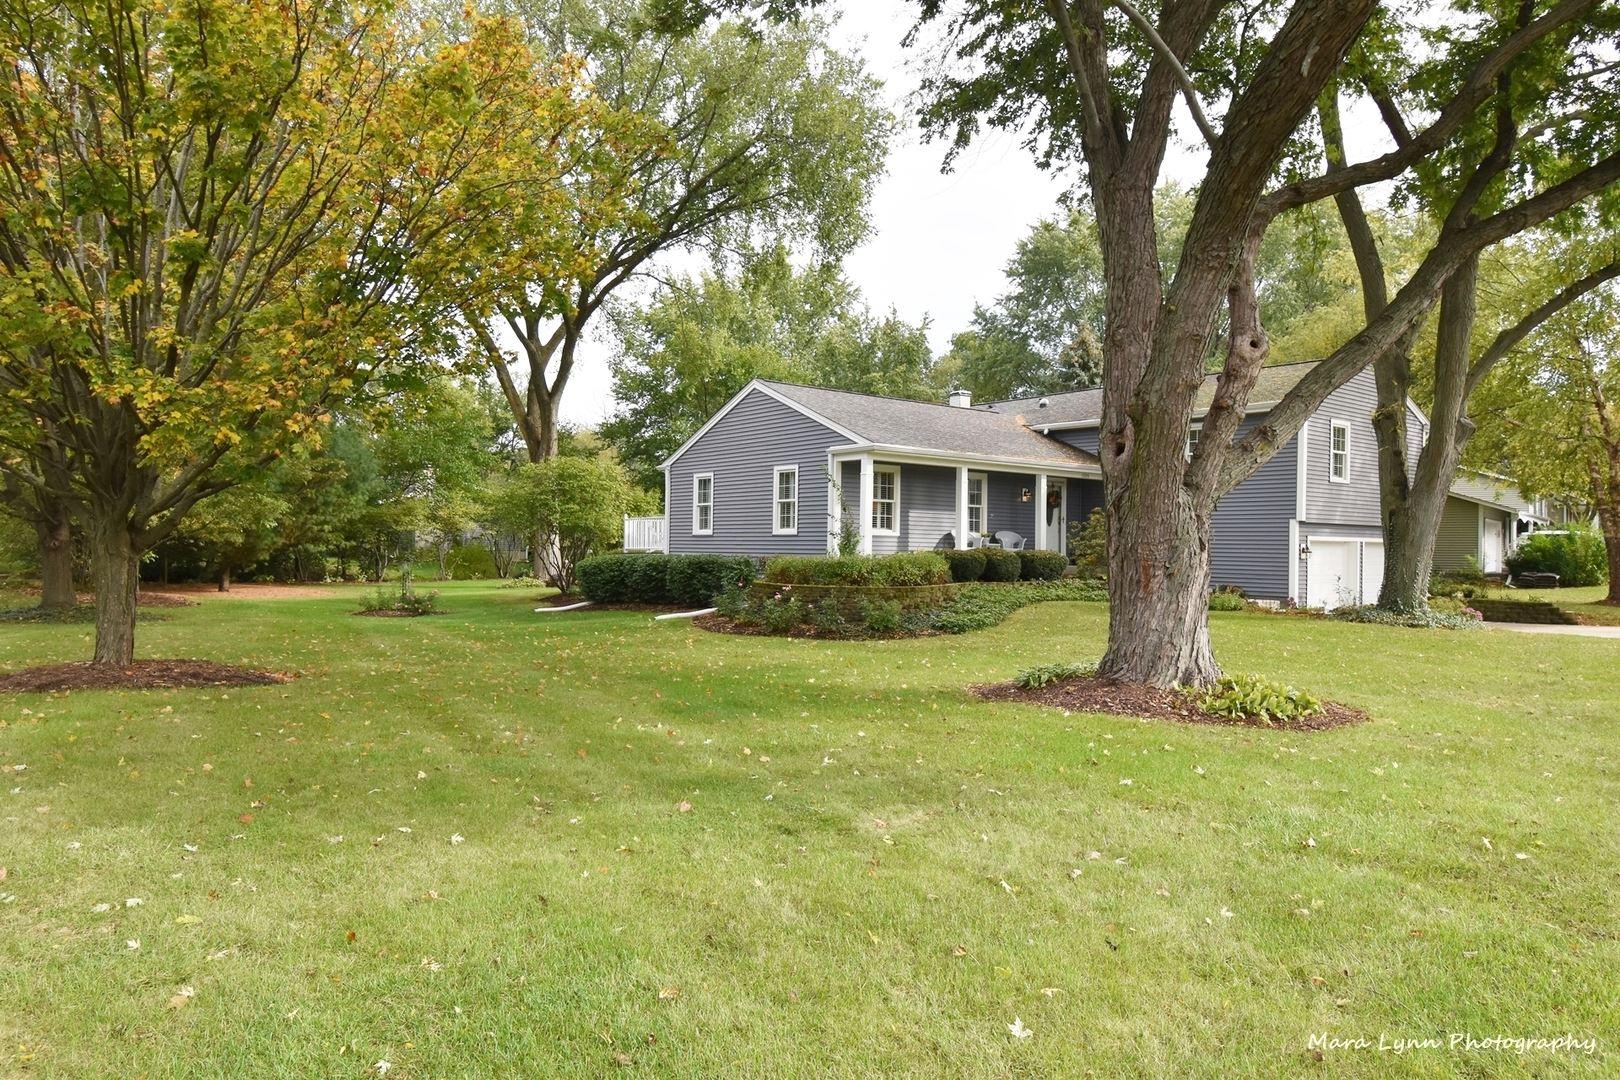 1305 Wintergreen Terrace, Batavia, IL 60510 - #: 11246231